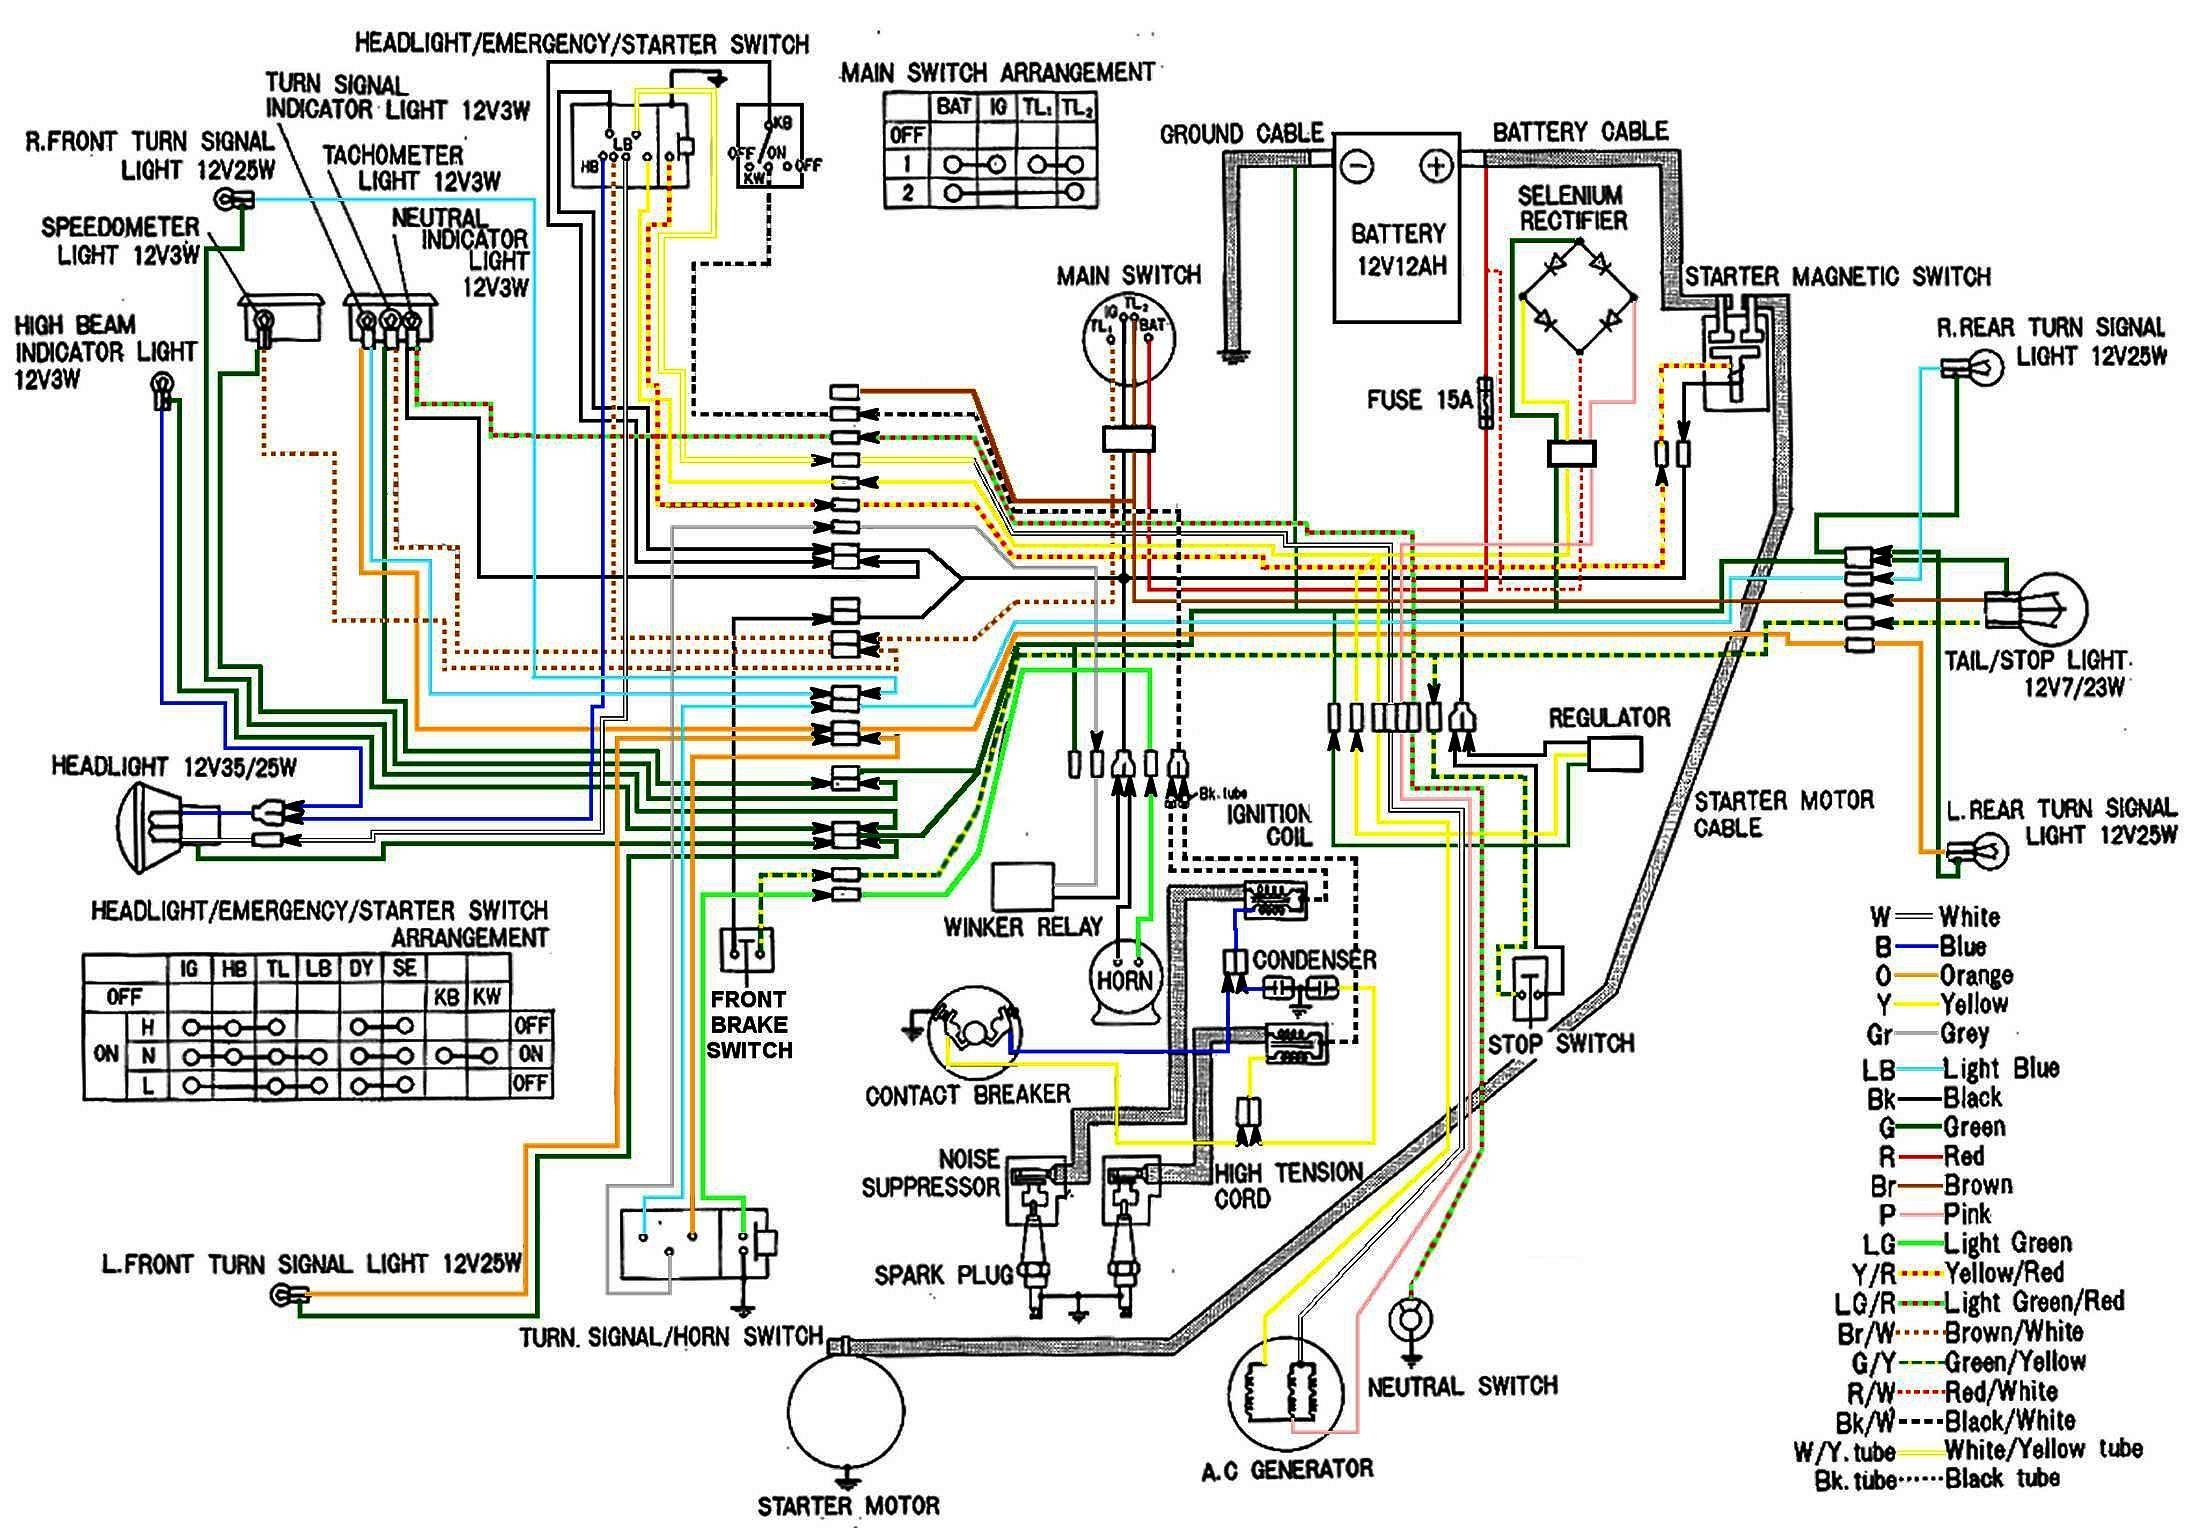 Diagram Rj45 Color Wiring Diagram Full Version Hd Quality Wiring Diagram Avdiagrams Cefalubb It